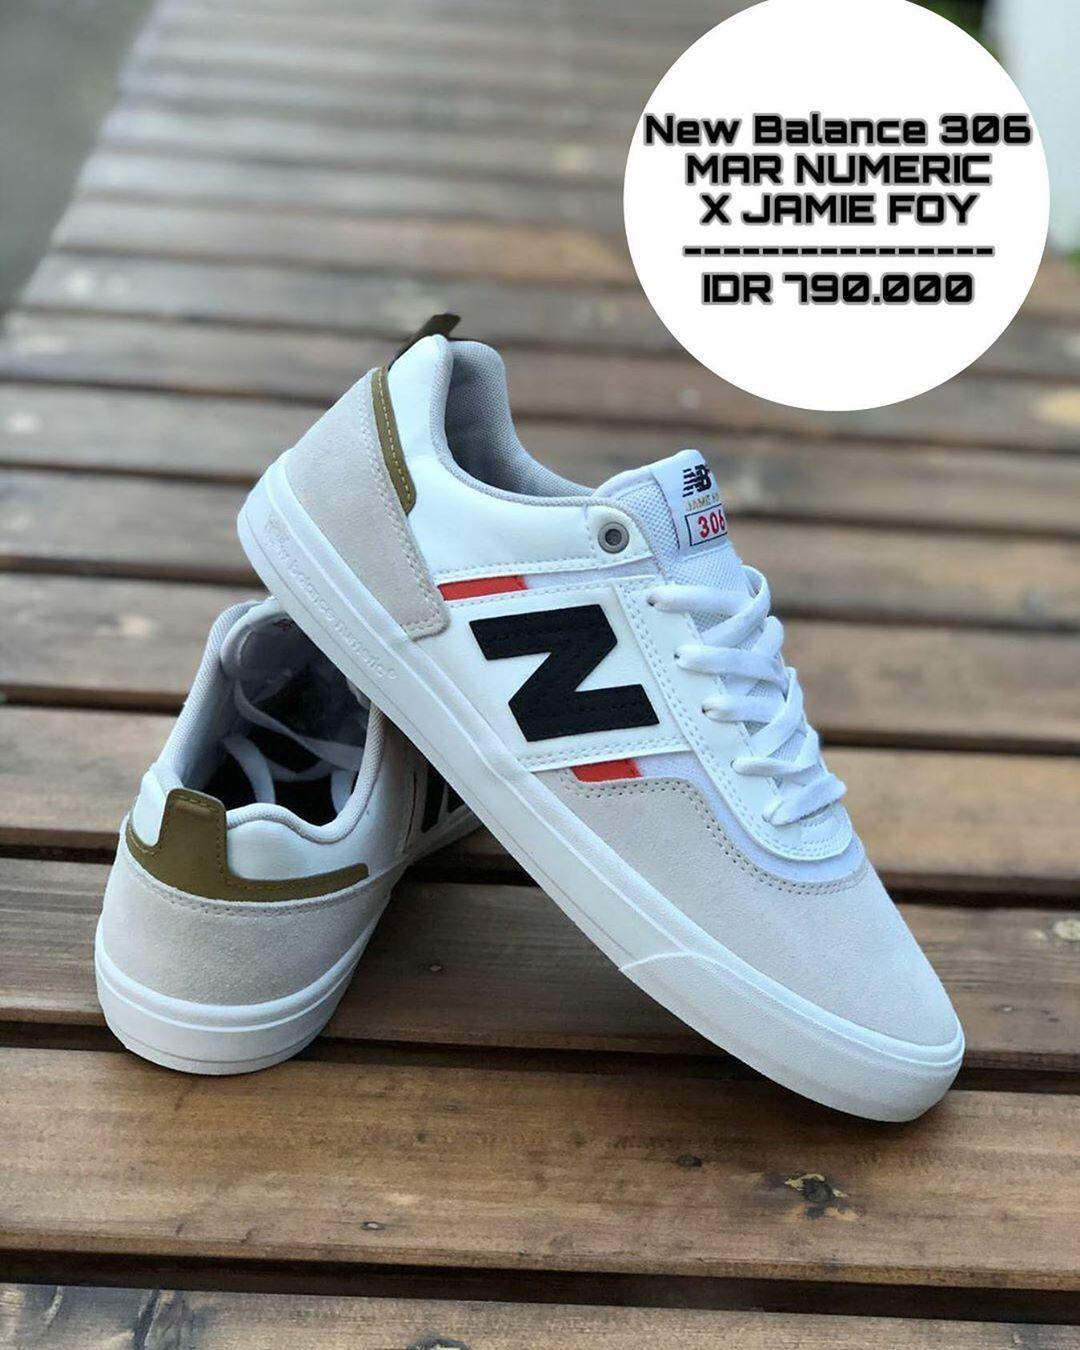 Sneakers, New balance, Tretorn sneaker